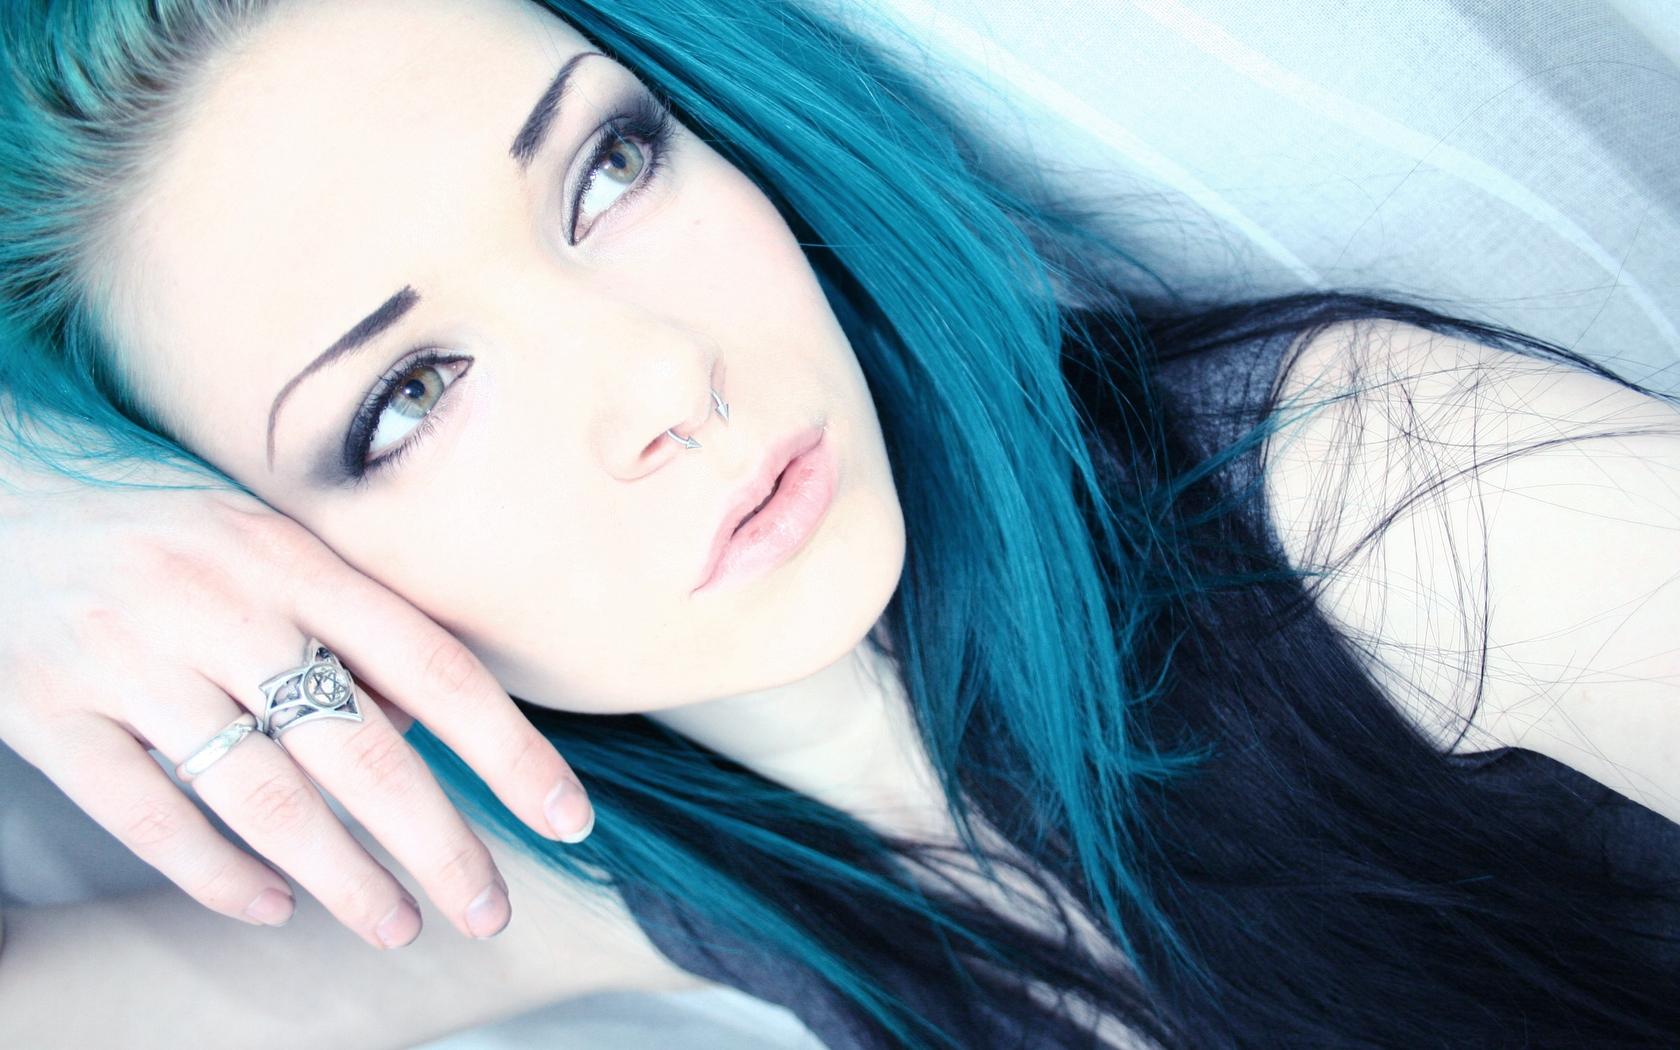 Chica con pelo azul - 1680x1050